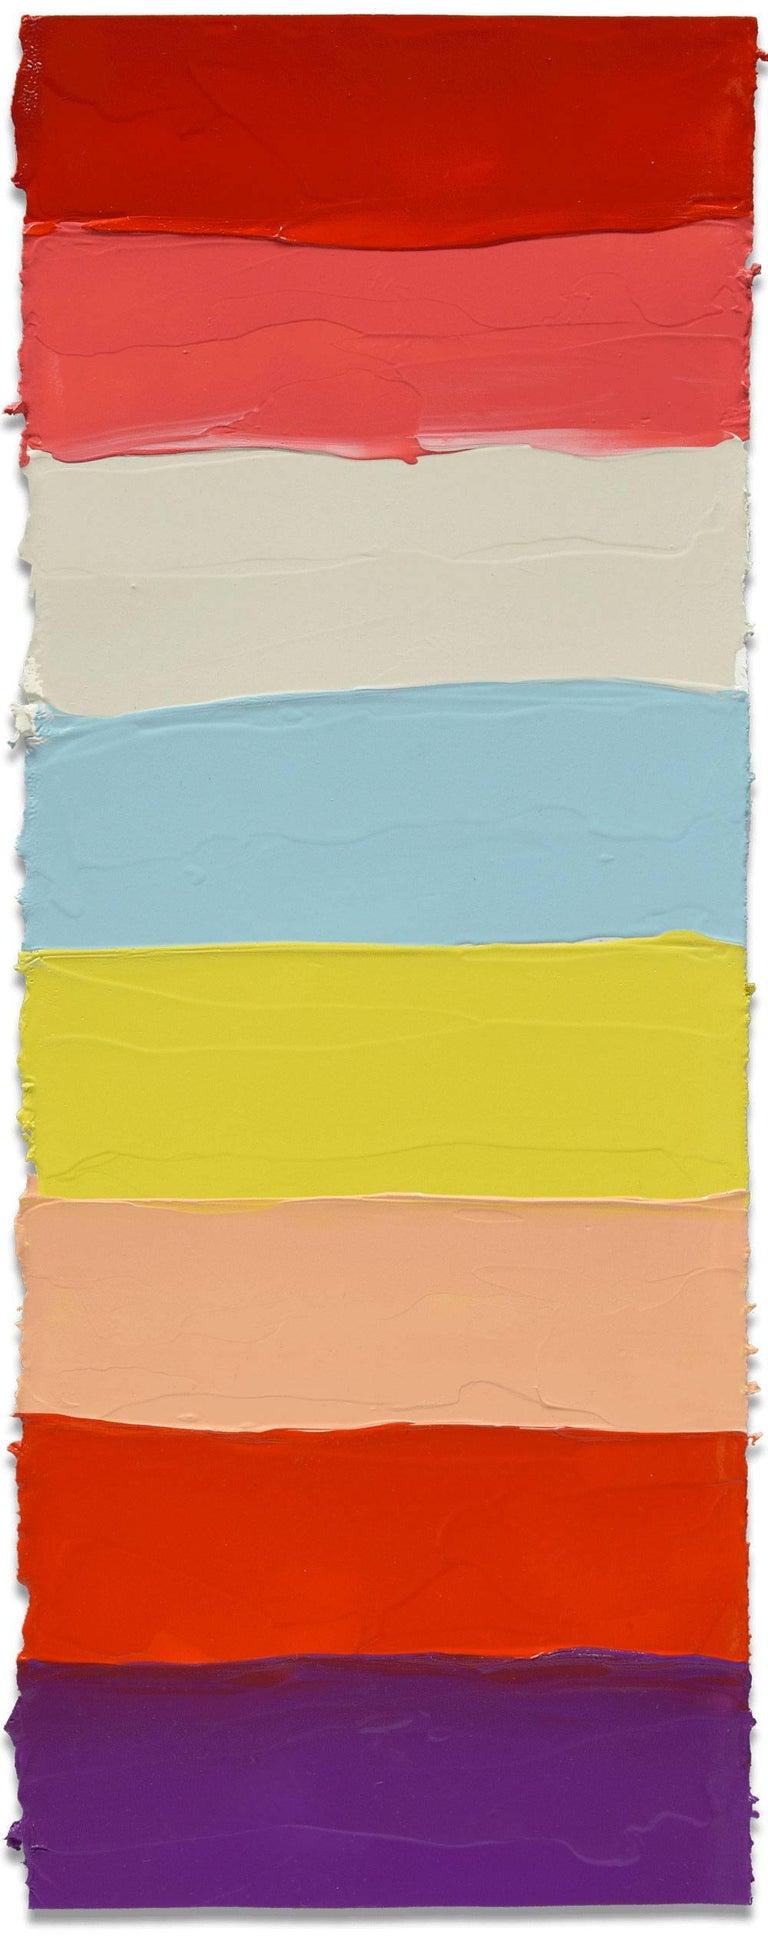 Anya Spielman Abstract Drawing - Hashtag